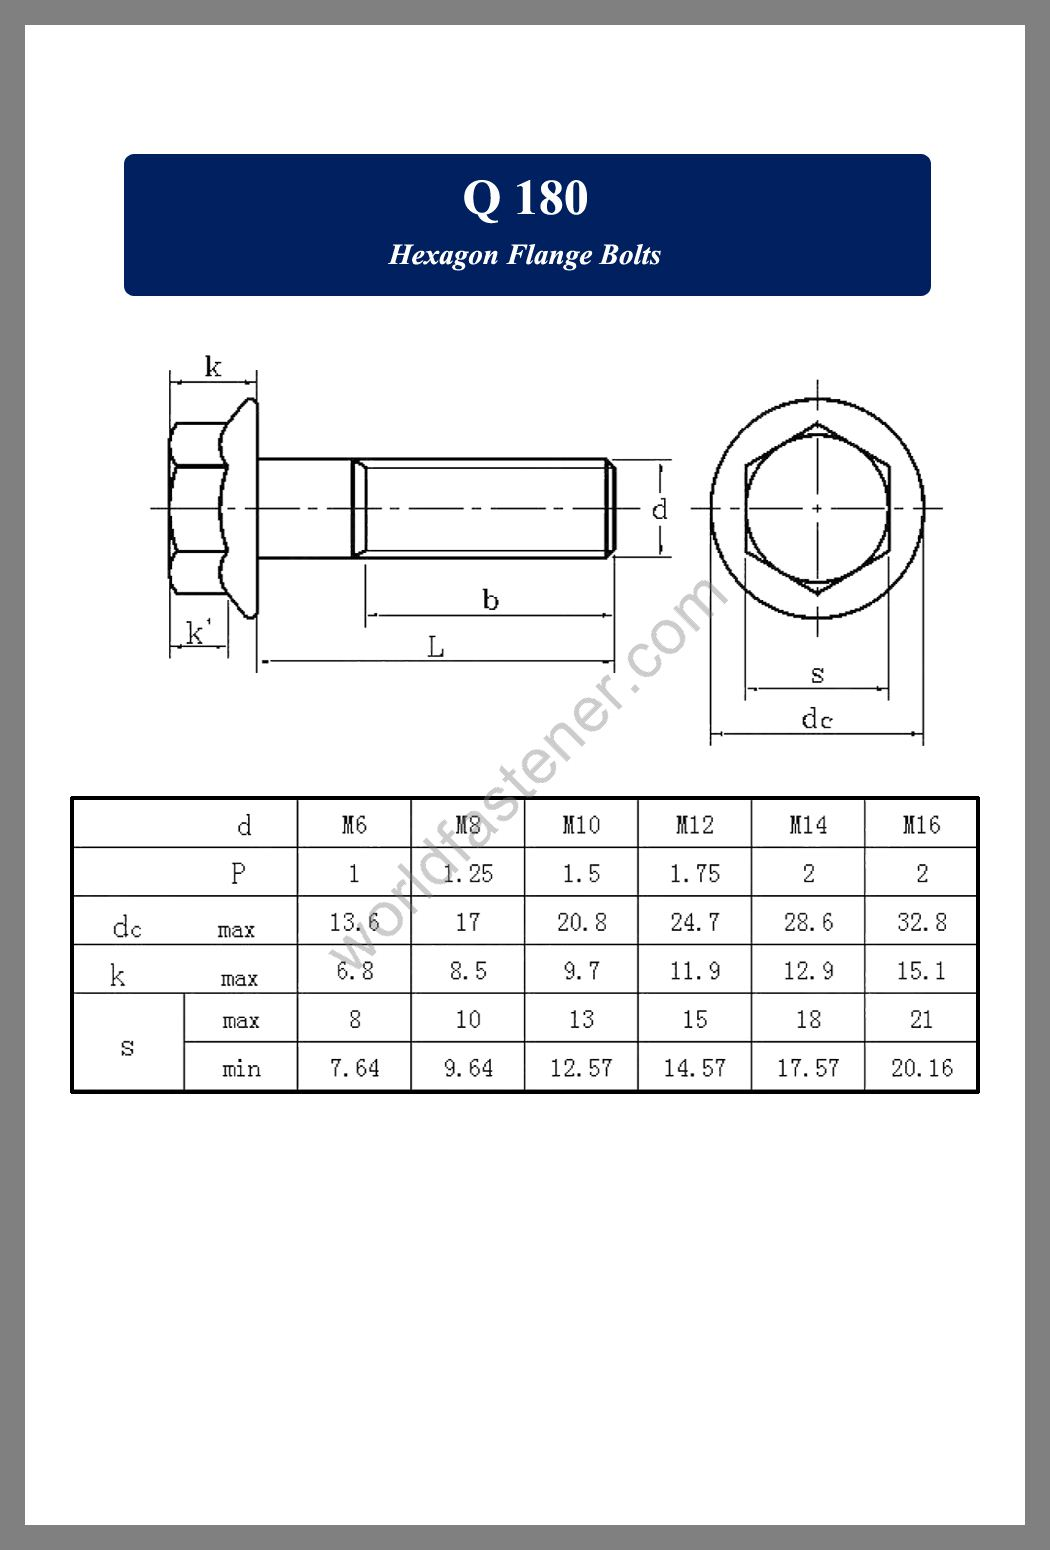 Q 180, Q 180 Flanged Bolts, Flange screws, fastener, screw, bolt, Q bolts